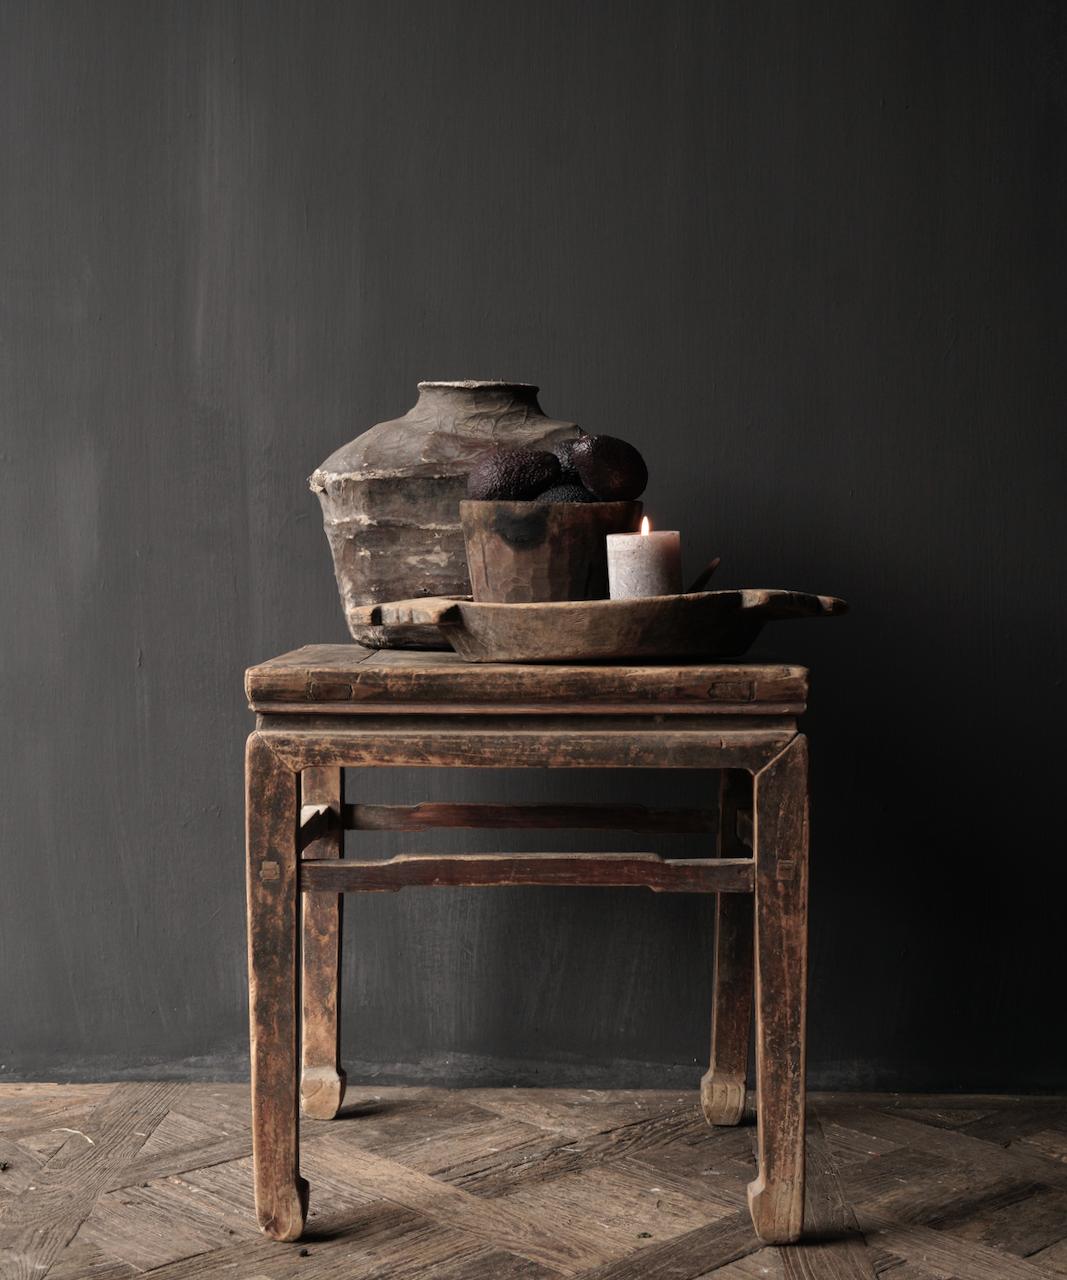 Oud Authentiek houten Salon/bijzet Tafeltje vierkant Uniek item-1